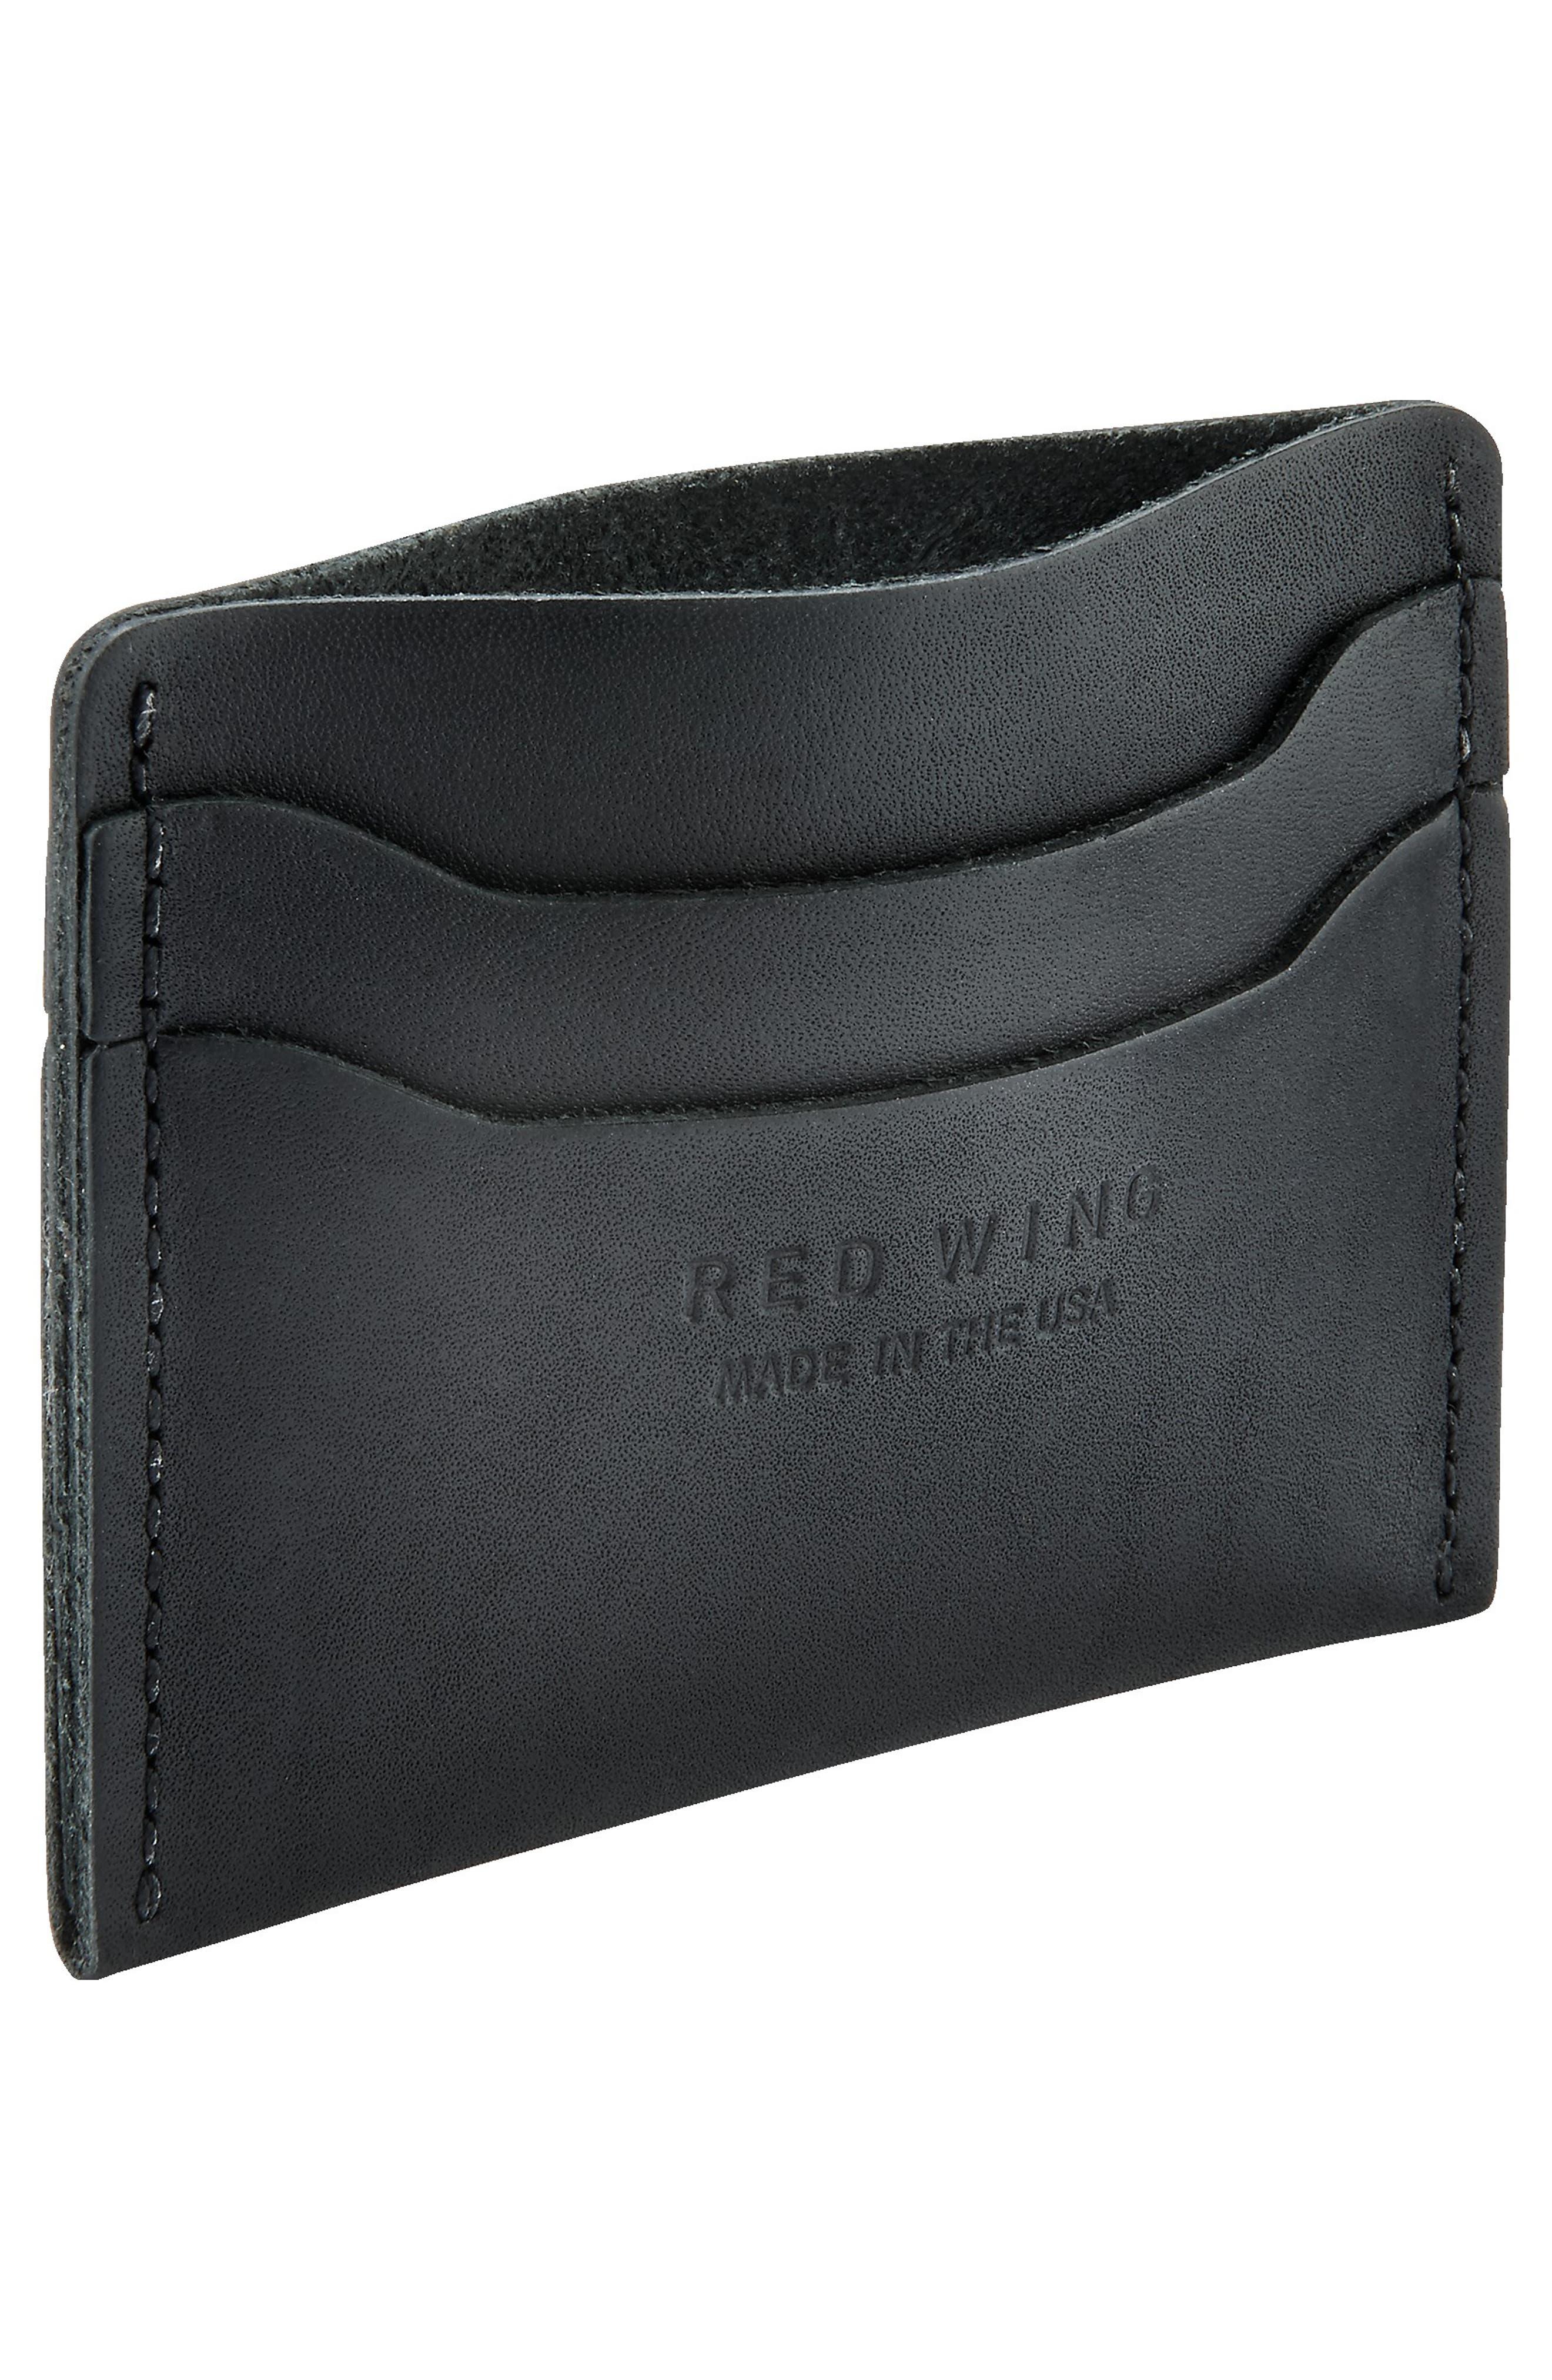 Leather Card Case,                             Alternate thumbnail 3, color,                             BLACK FRONTIER